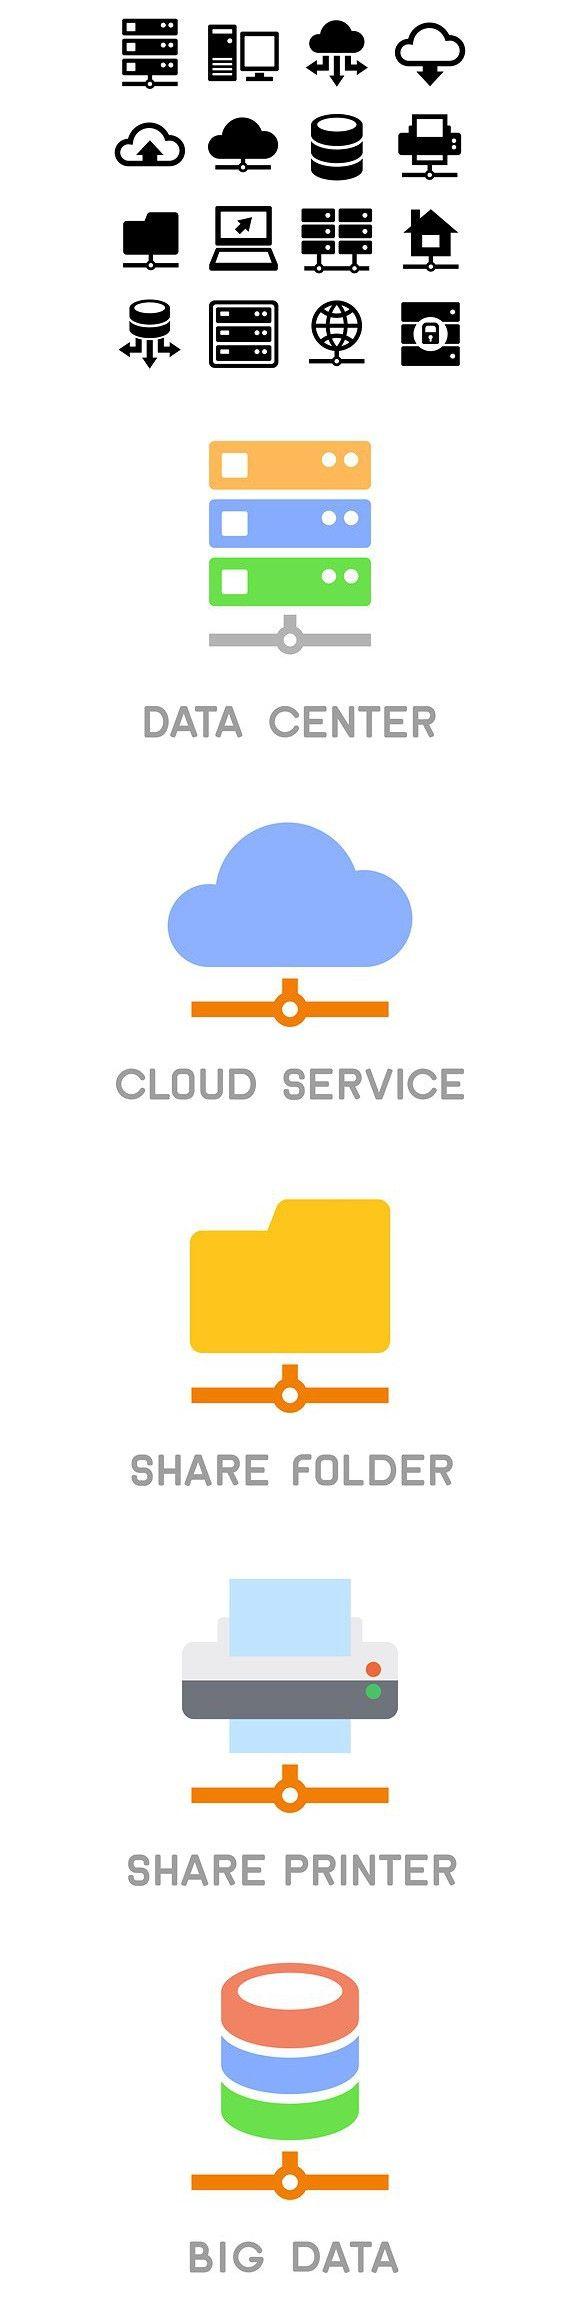 Wireless icon line iconset iconsmind - Big Data Center And Server Icons Technology Icons 6 00